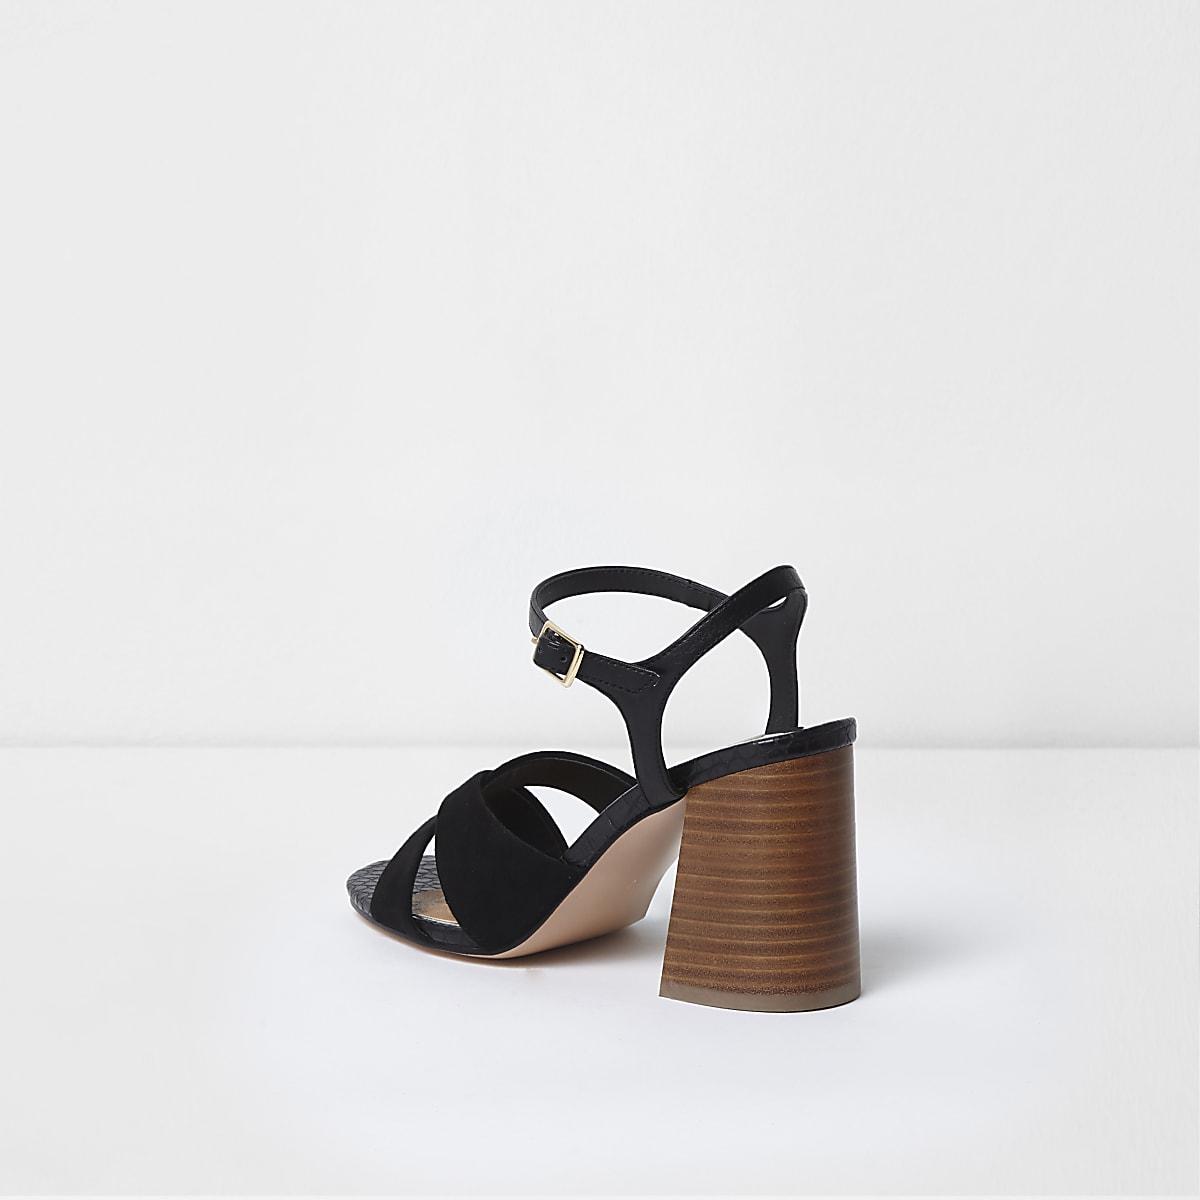 e5a43d8a496 Black wide fit cross strap block heel sandals - Sandals - Shoes   Boots -  women